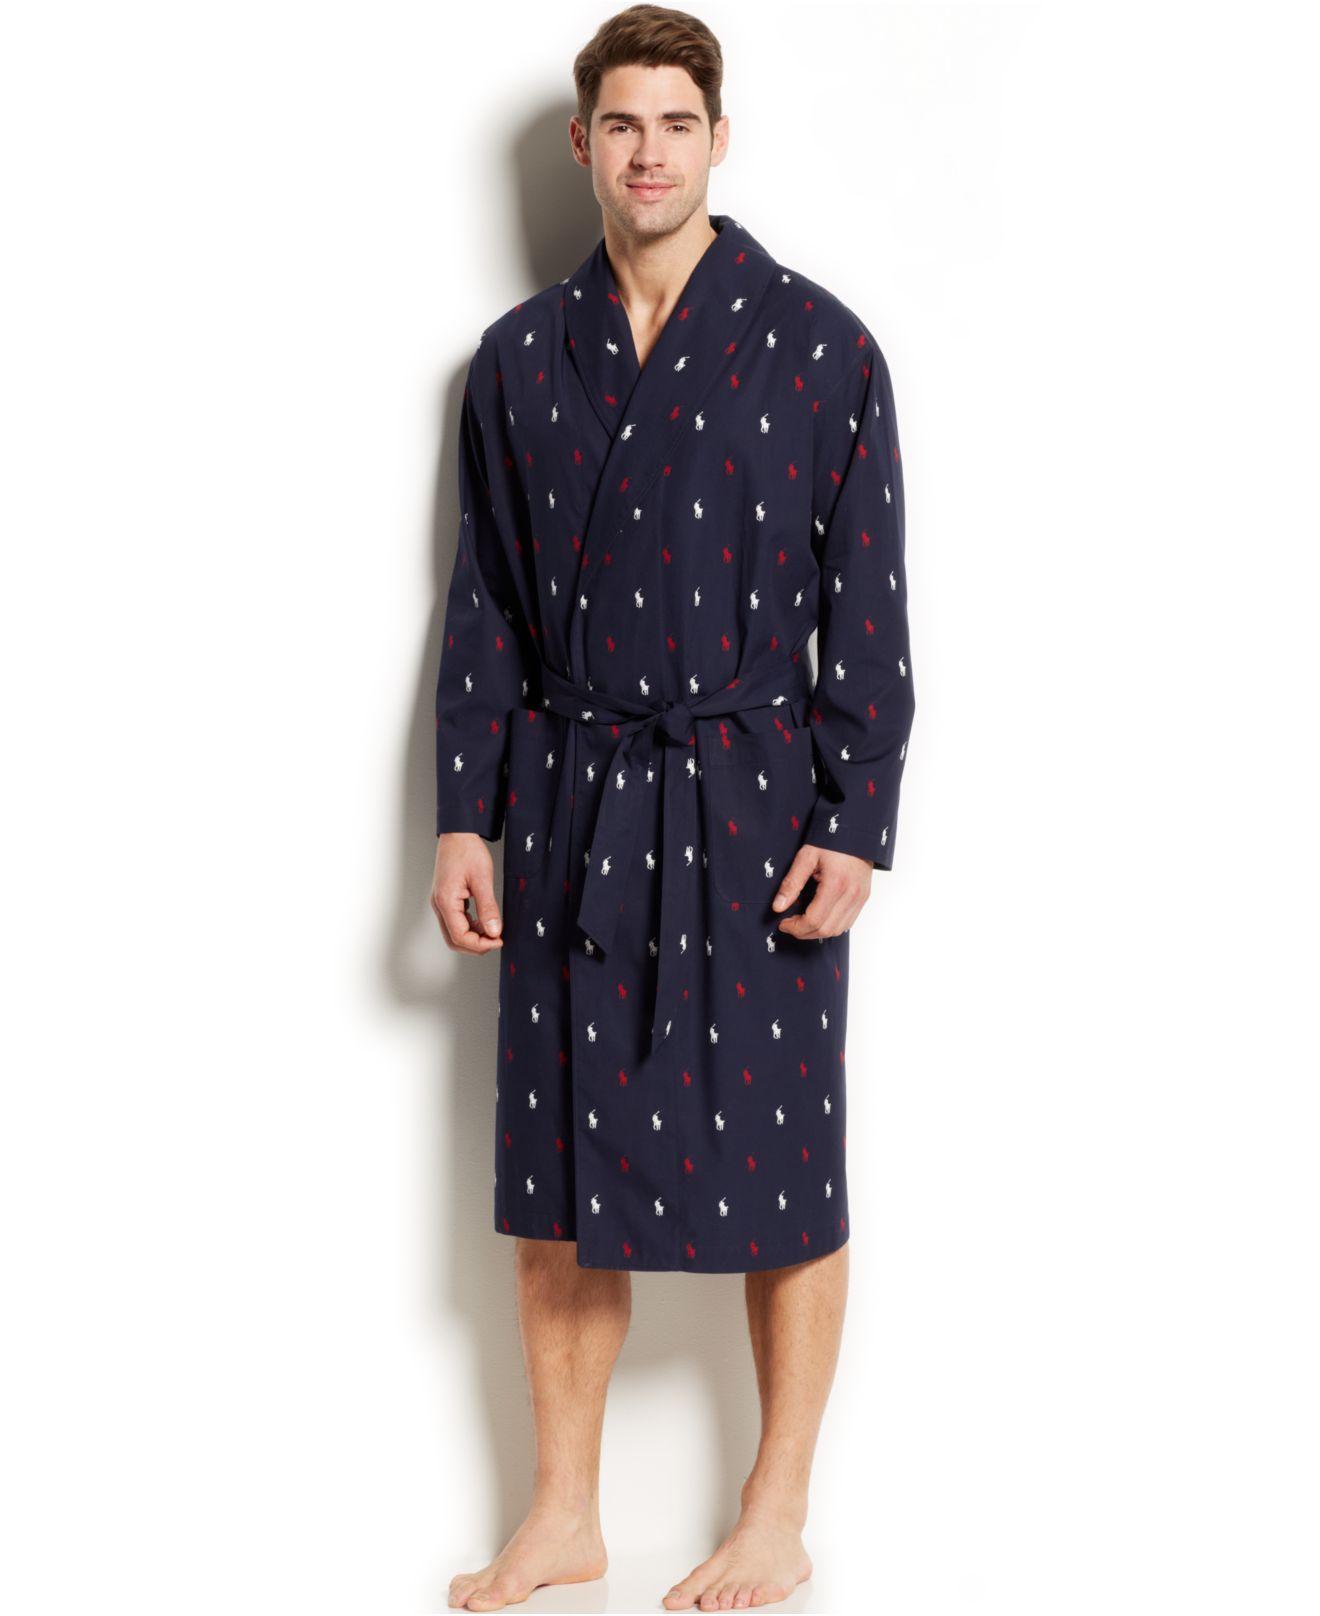 lyst polo ralph lauren allover pony robe in blue for men. Black Bedroom Furniture Sets. Home Design Ideas